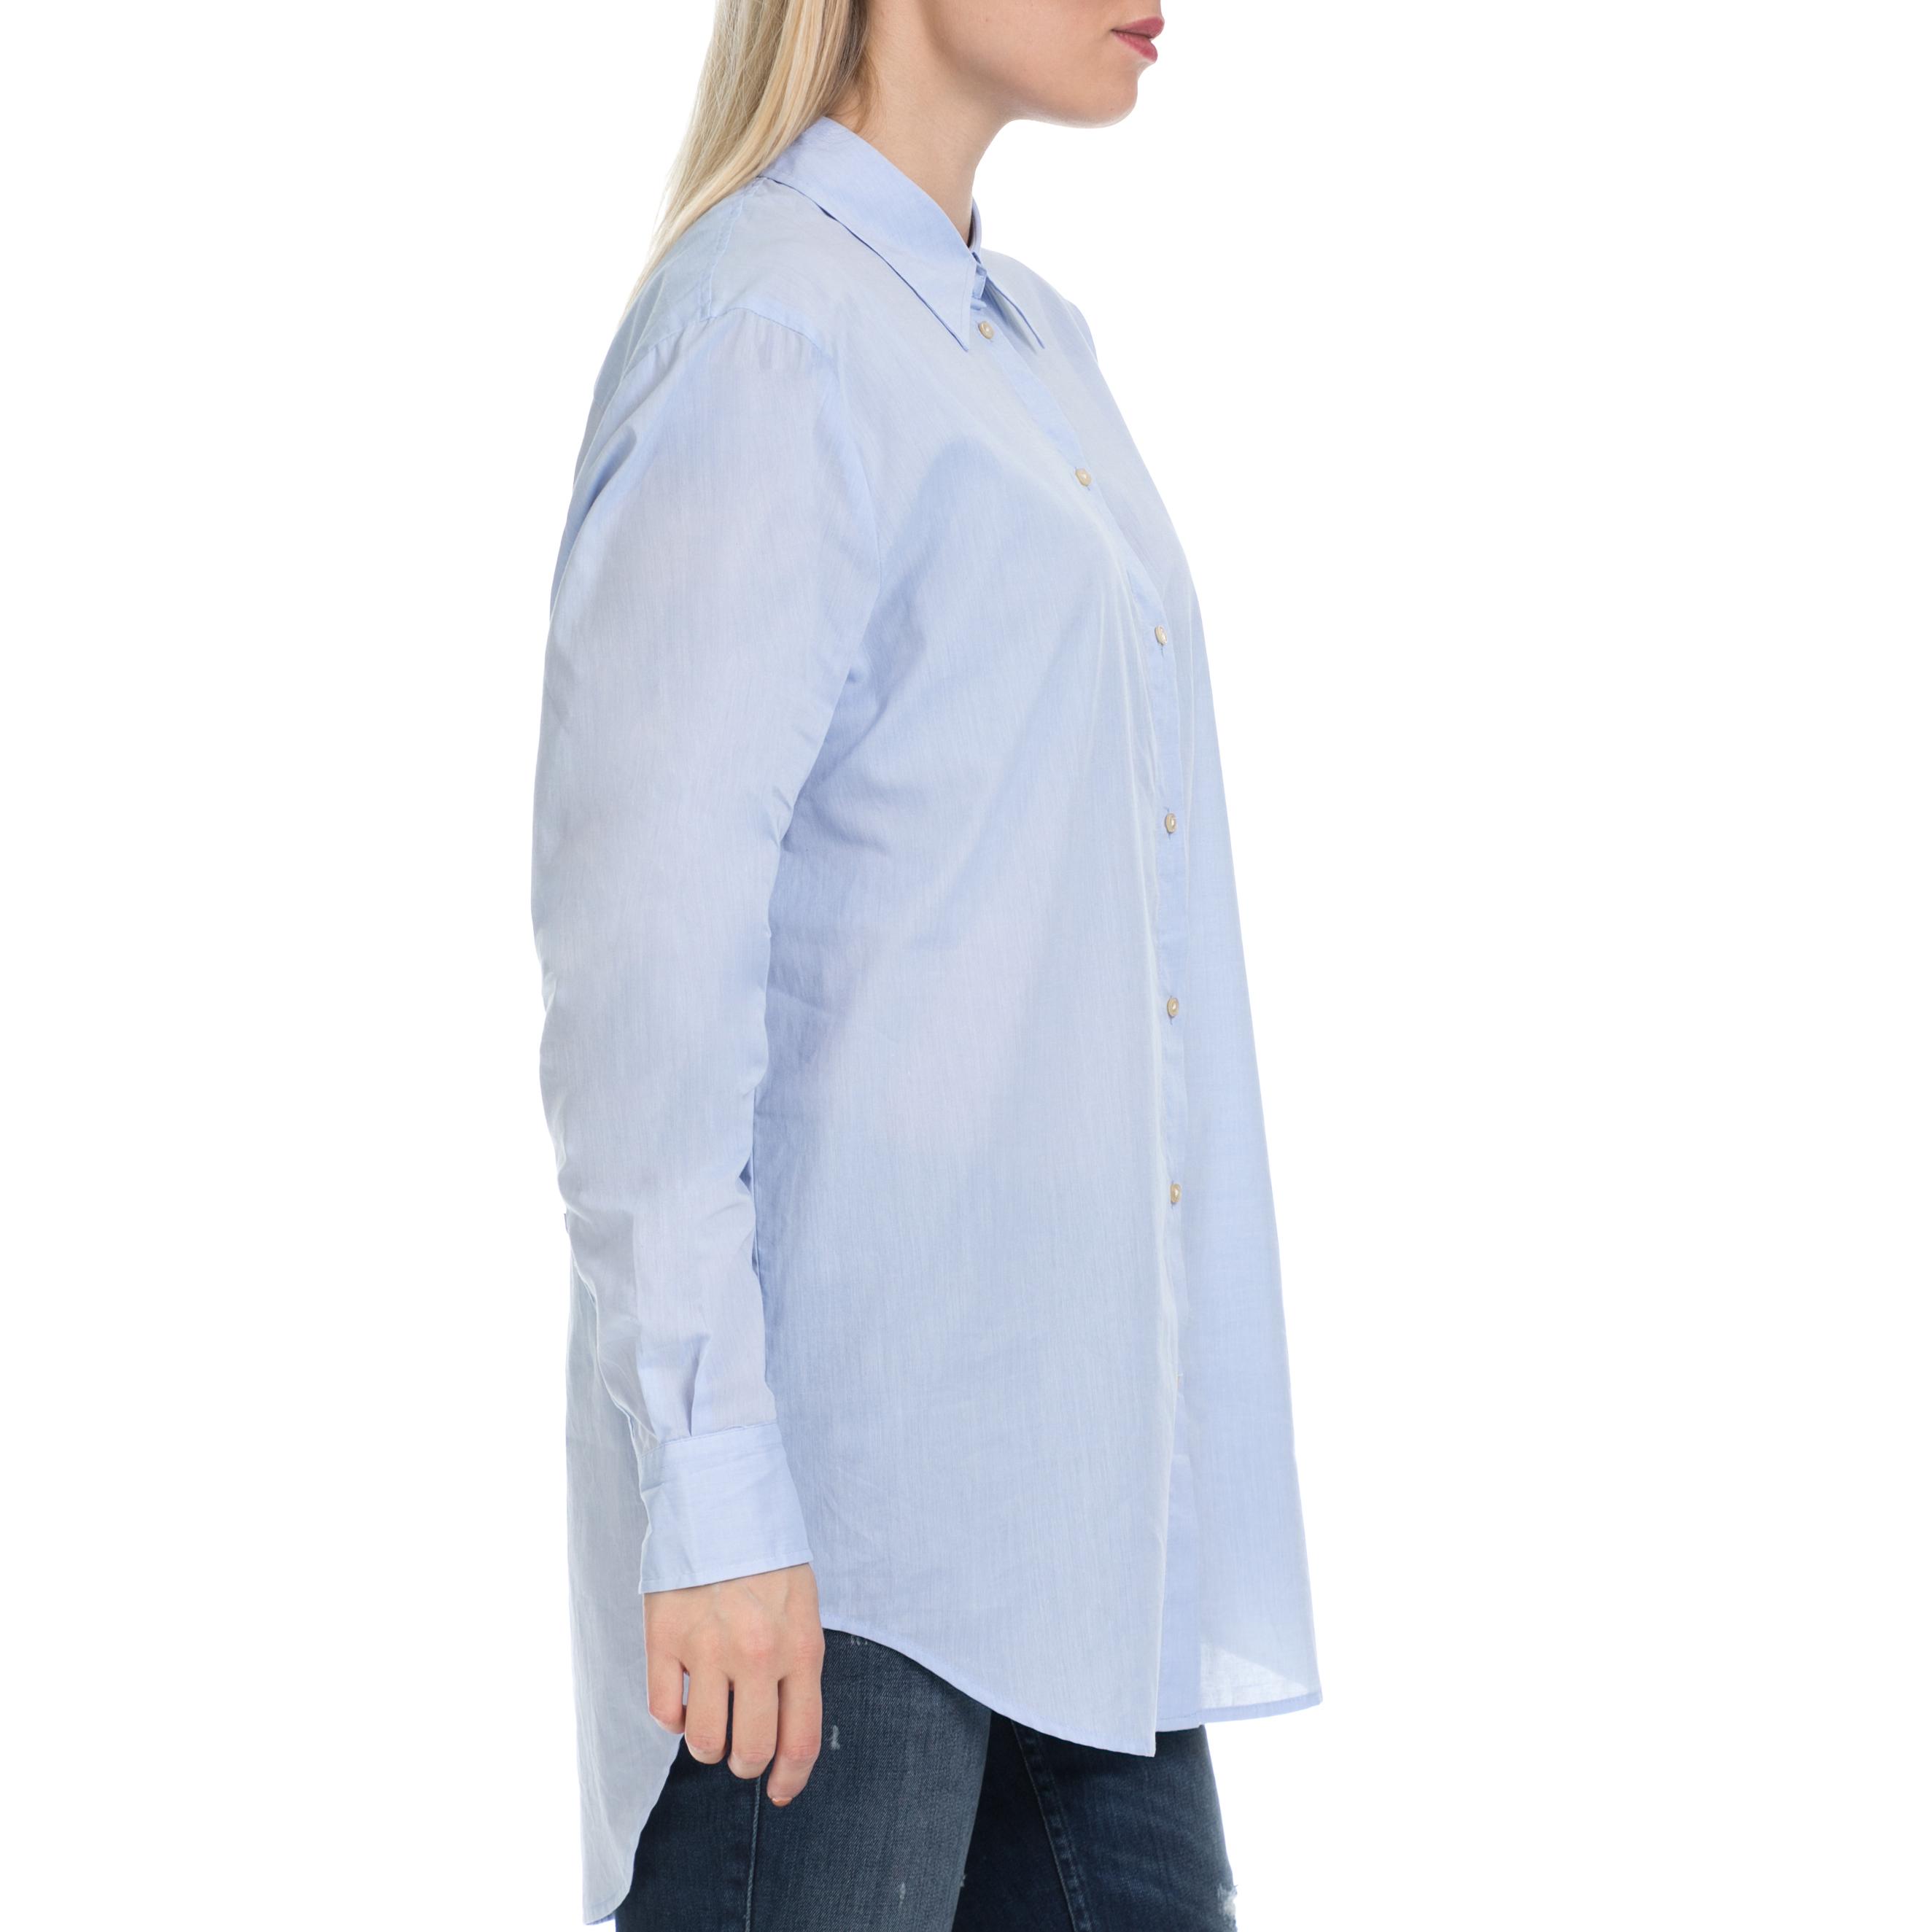 67d6b76dbc2d SCOTCH   SODA - Γυναικείο πουκάμισο MAISON SCOTCH μπλε